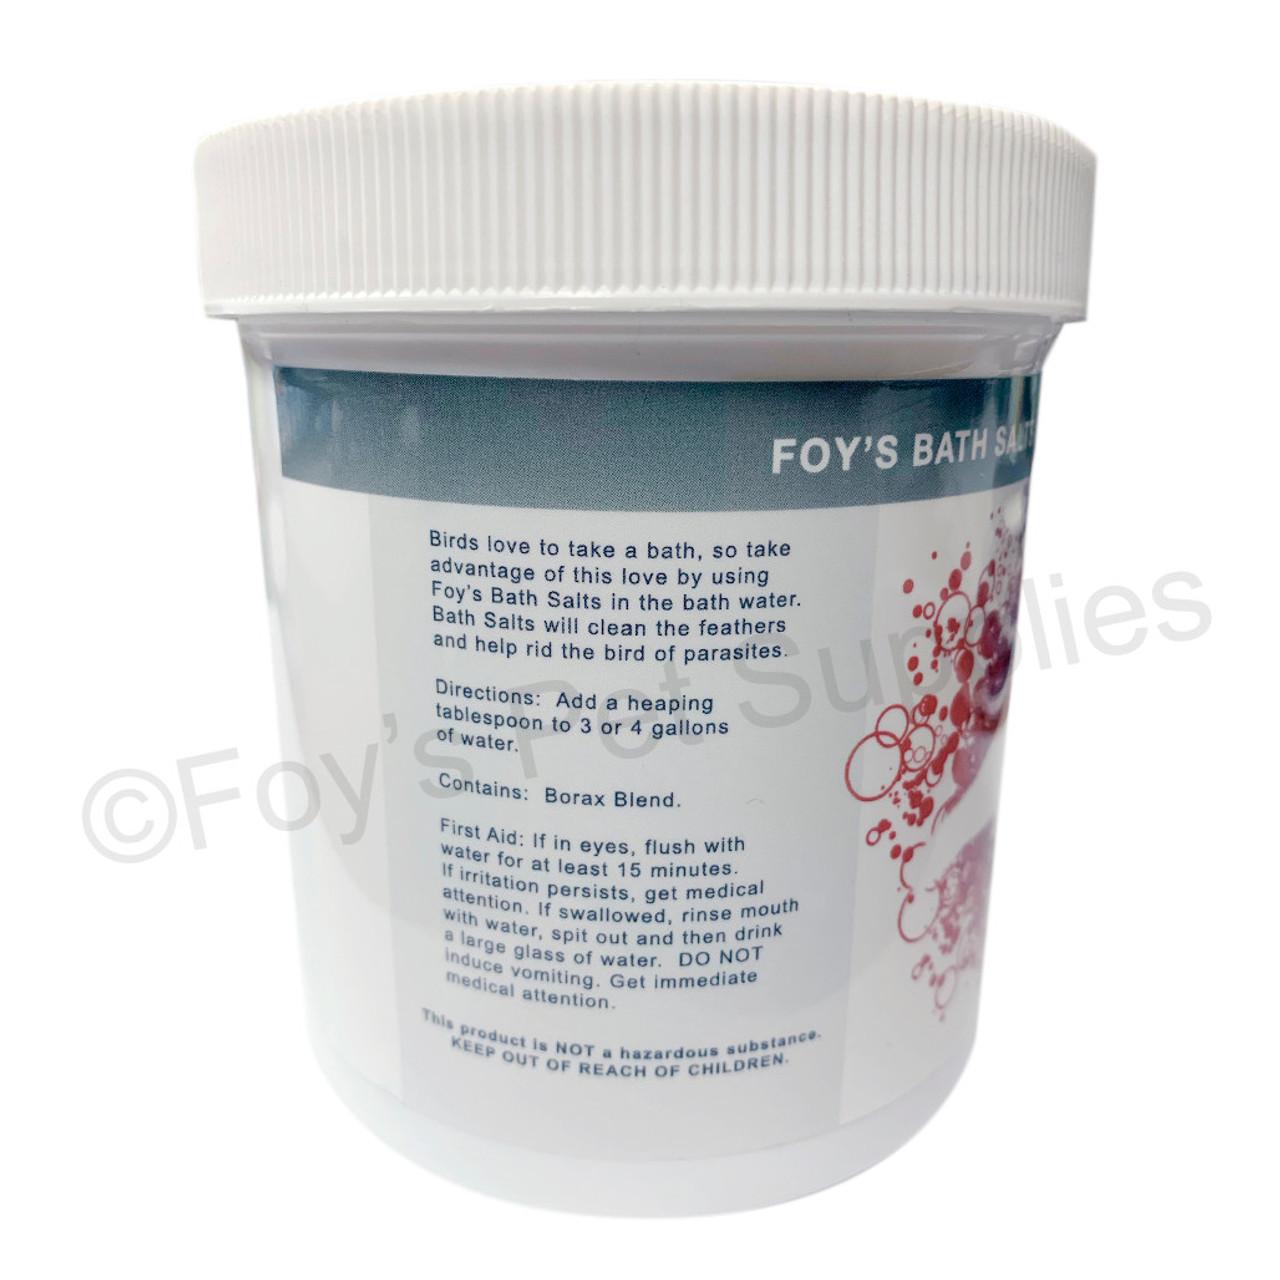 foy's bath salts